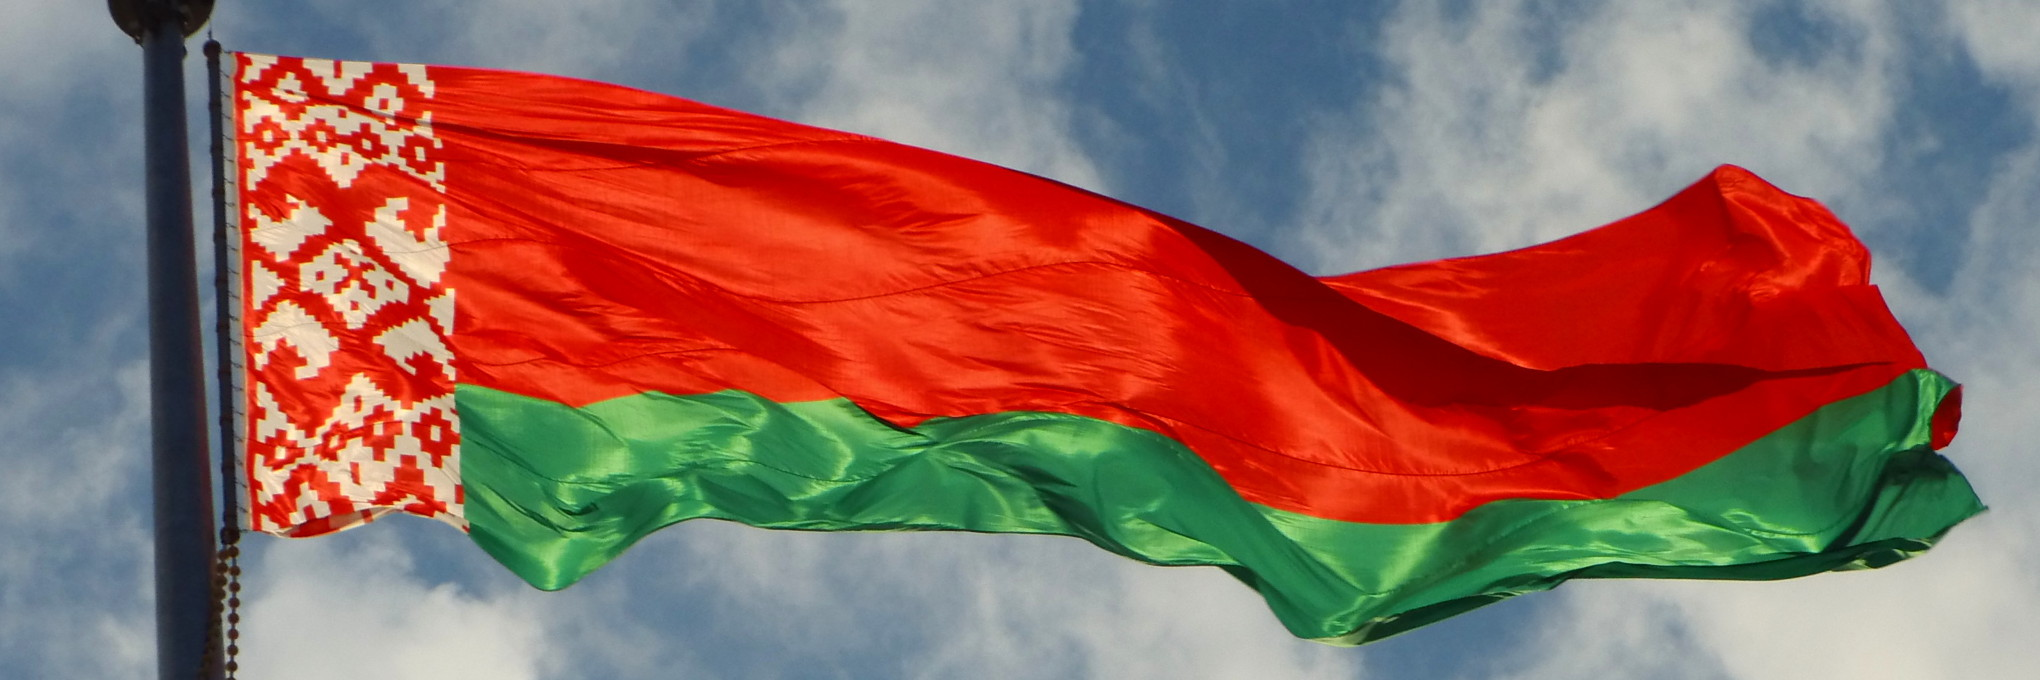 Граждане Республики Беларусь. Фото: User 699, CC BY-SA 4.0.